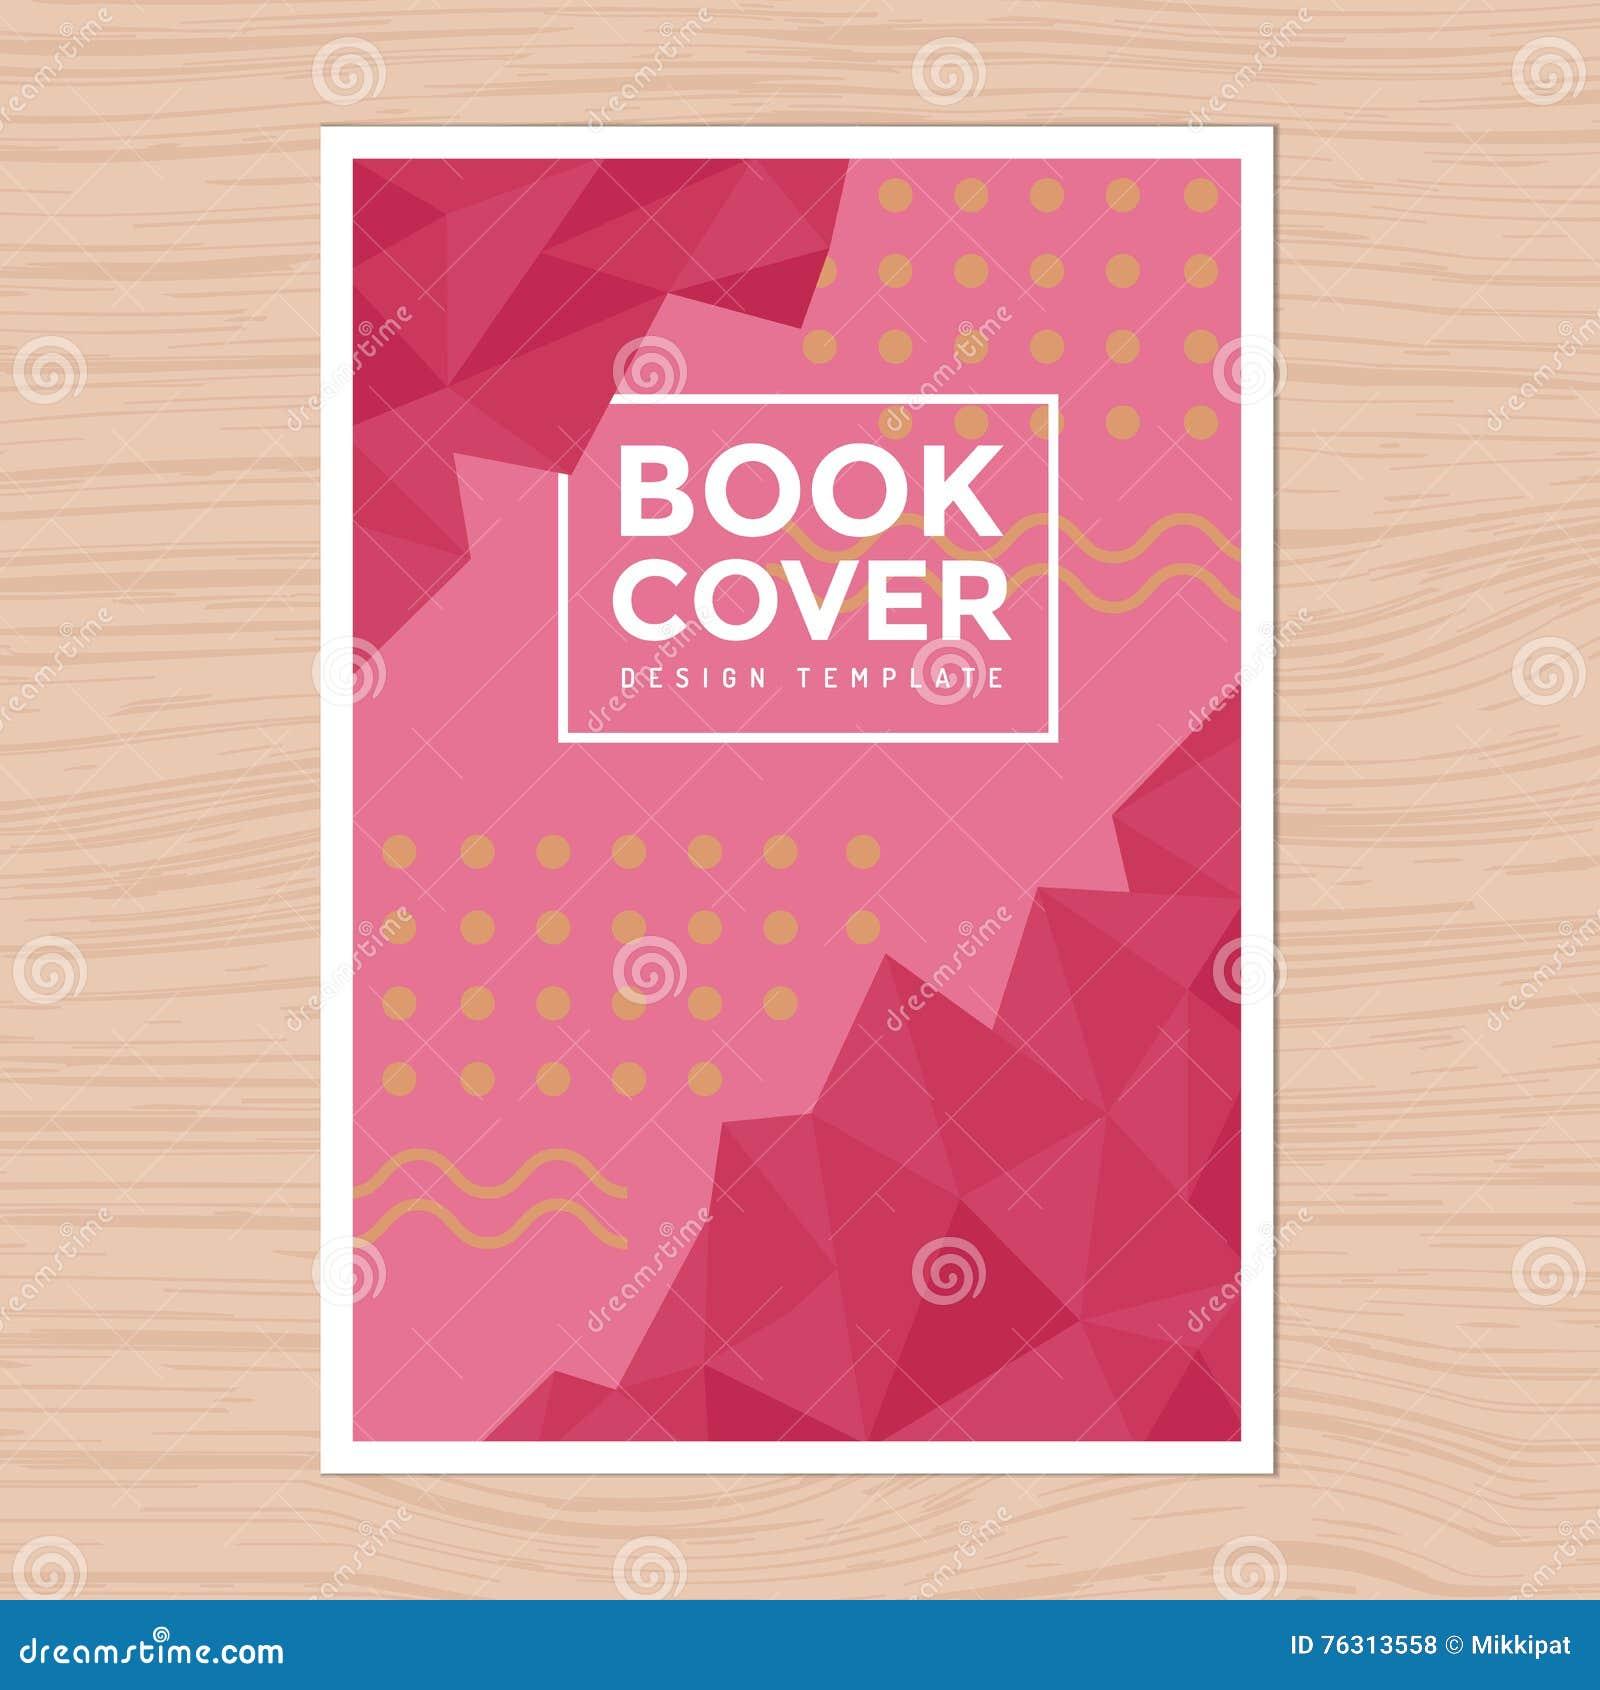 Simple Book Cover Design Template : 现代设计书套, poster, flyer, company公司概况,年终报告在a 大小的设计版面模板 向量例证